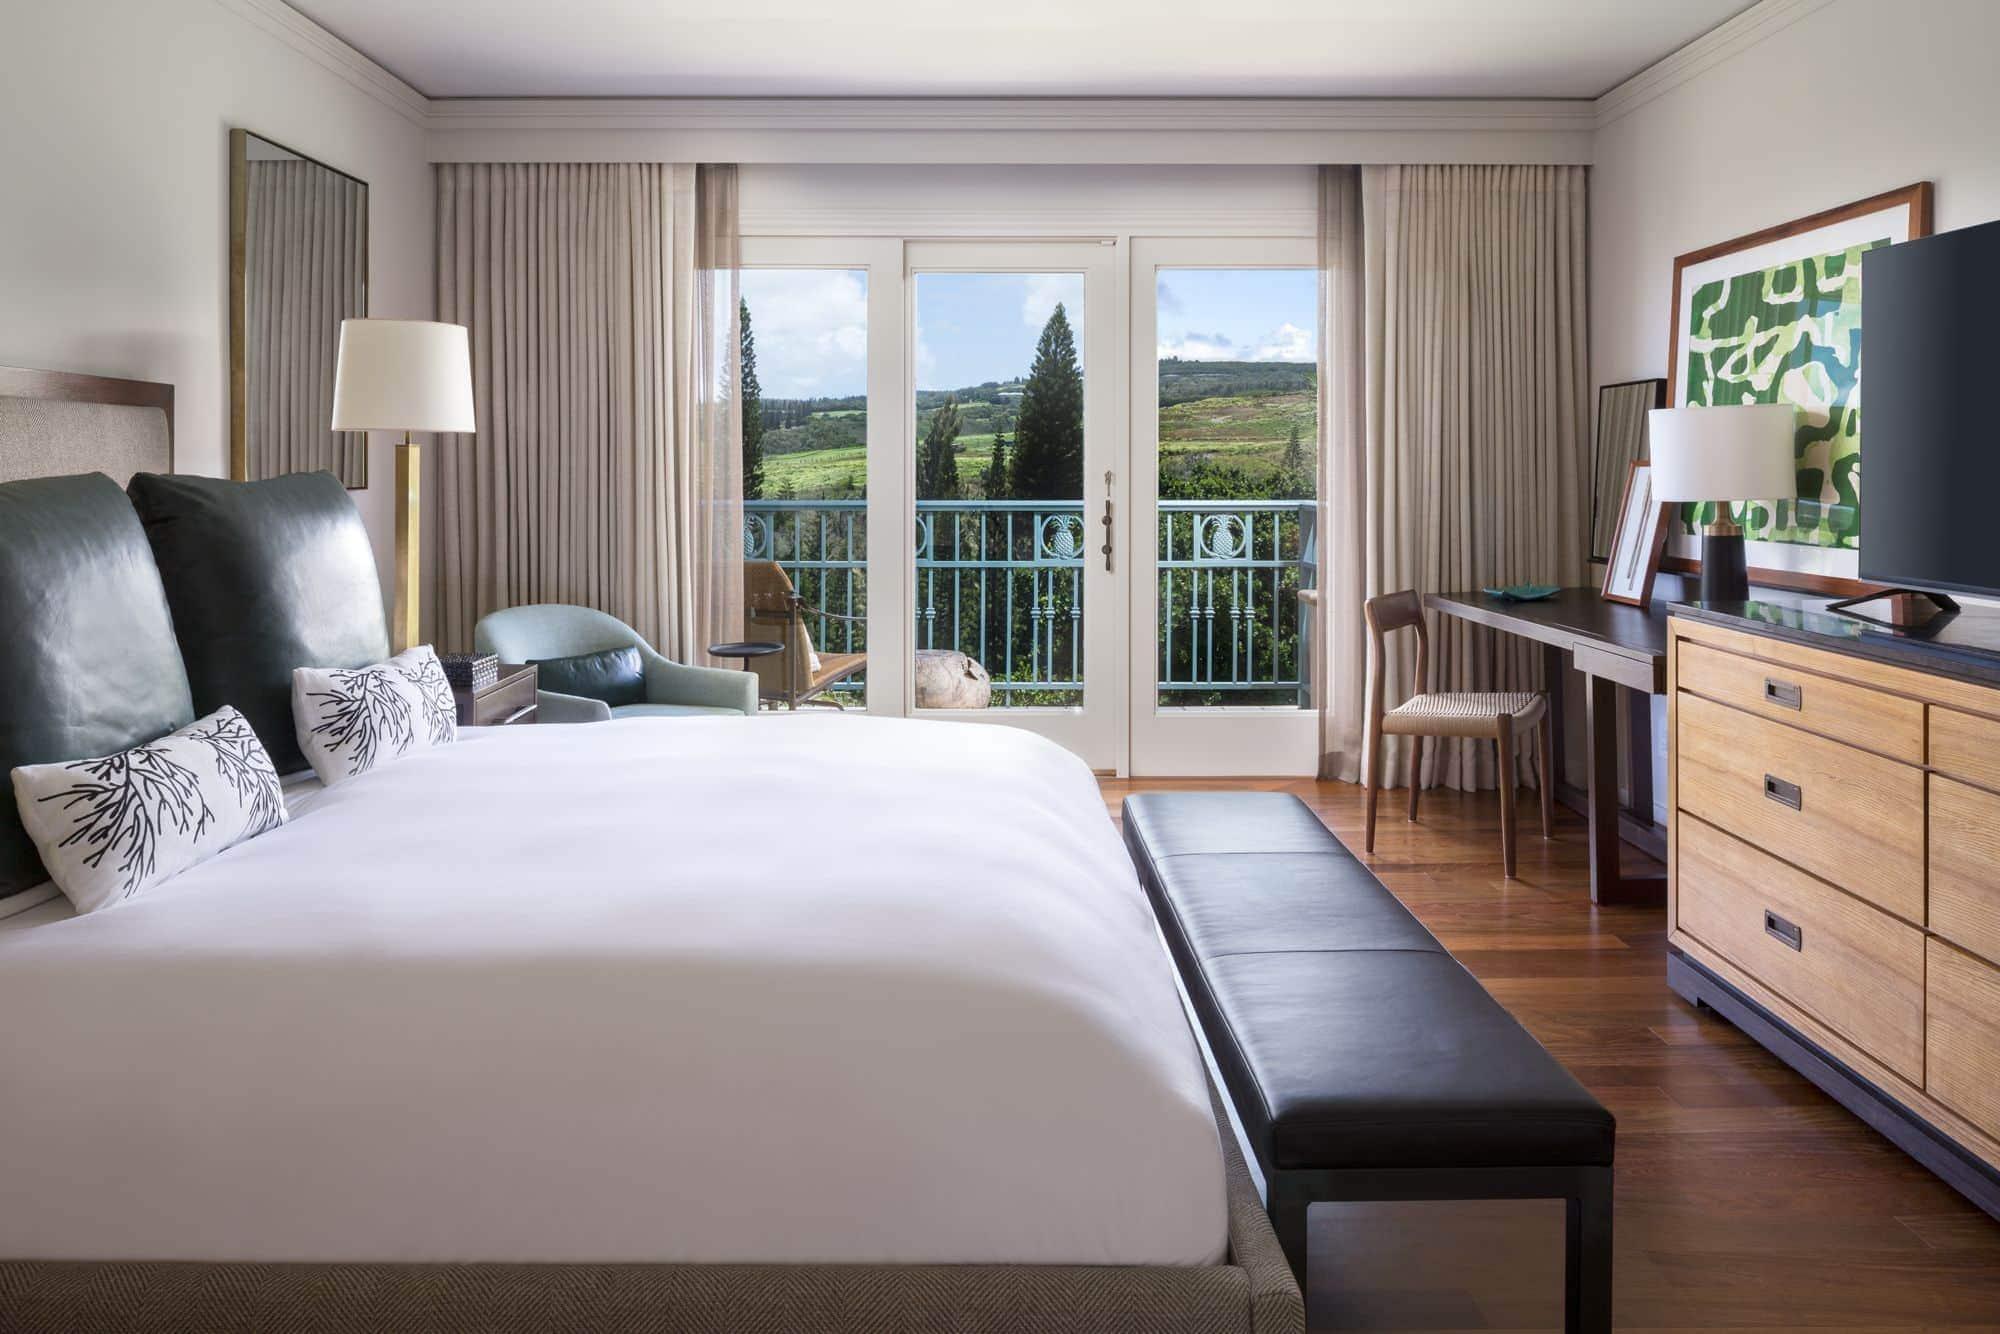 A romantic hotel room at the Ritz-Carlton, Kapalua